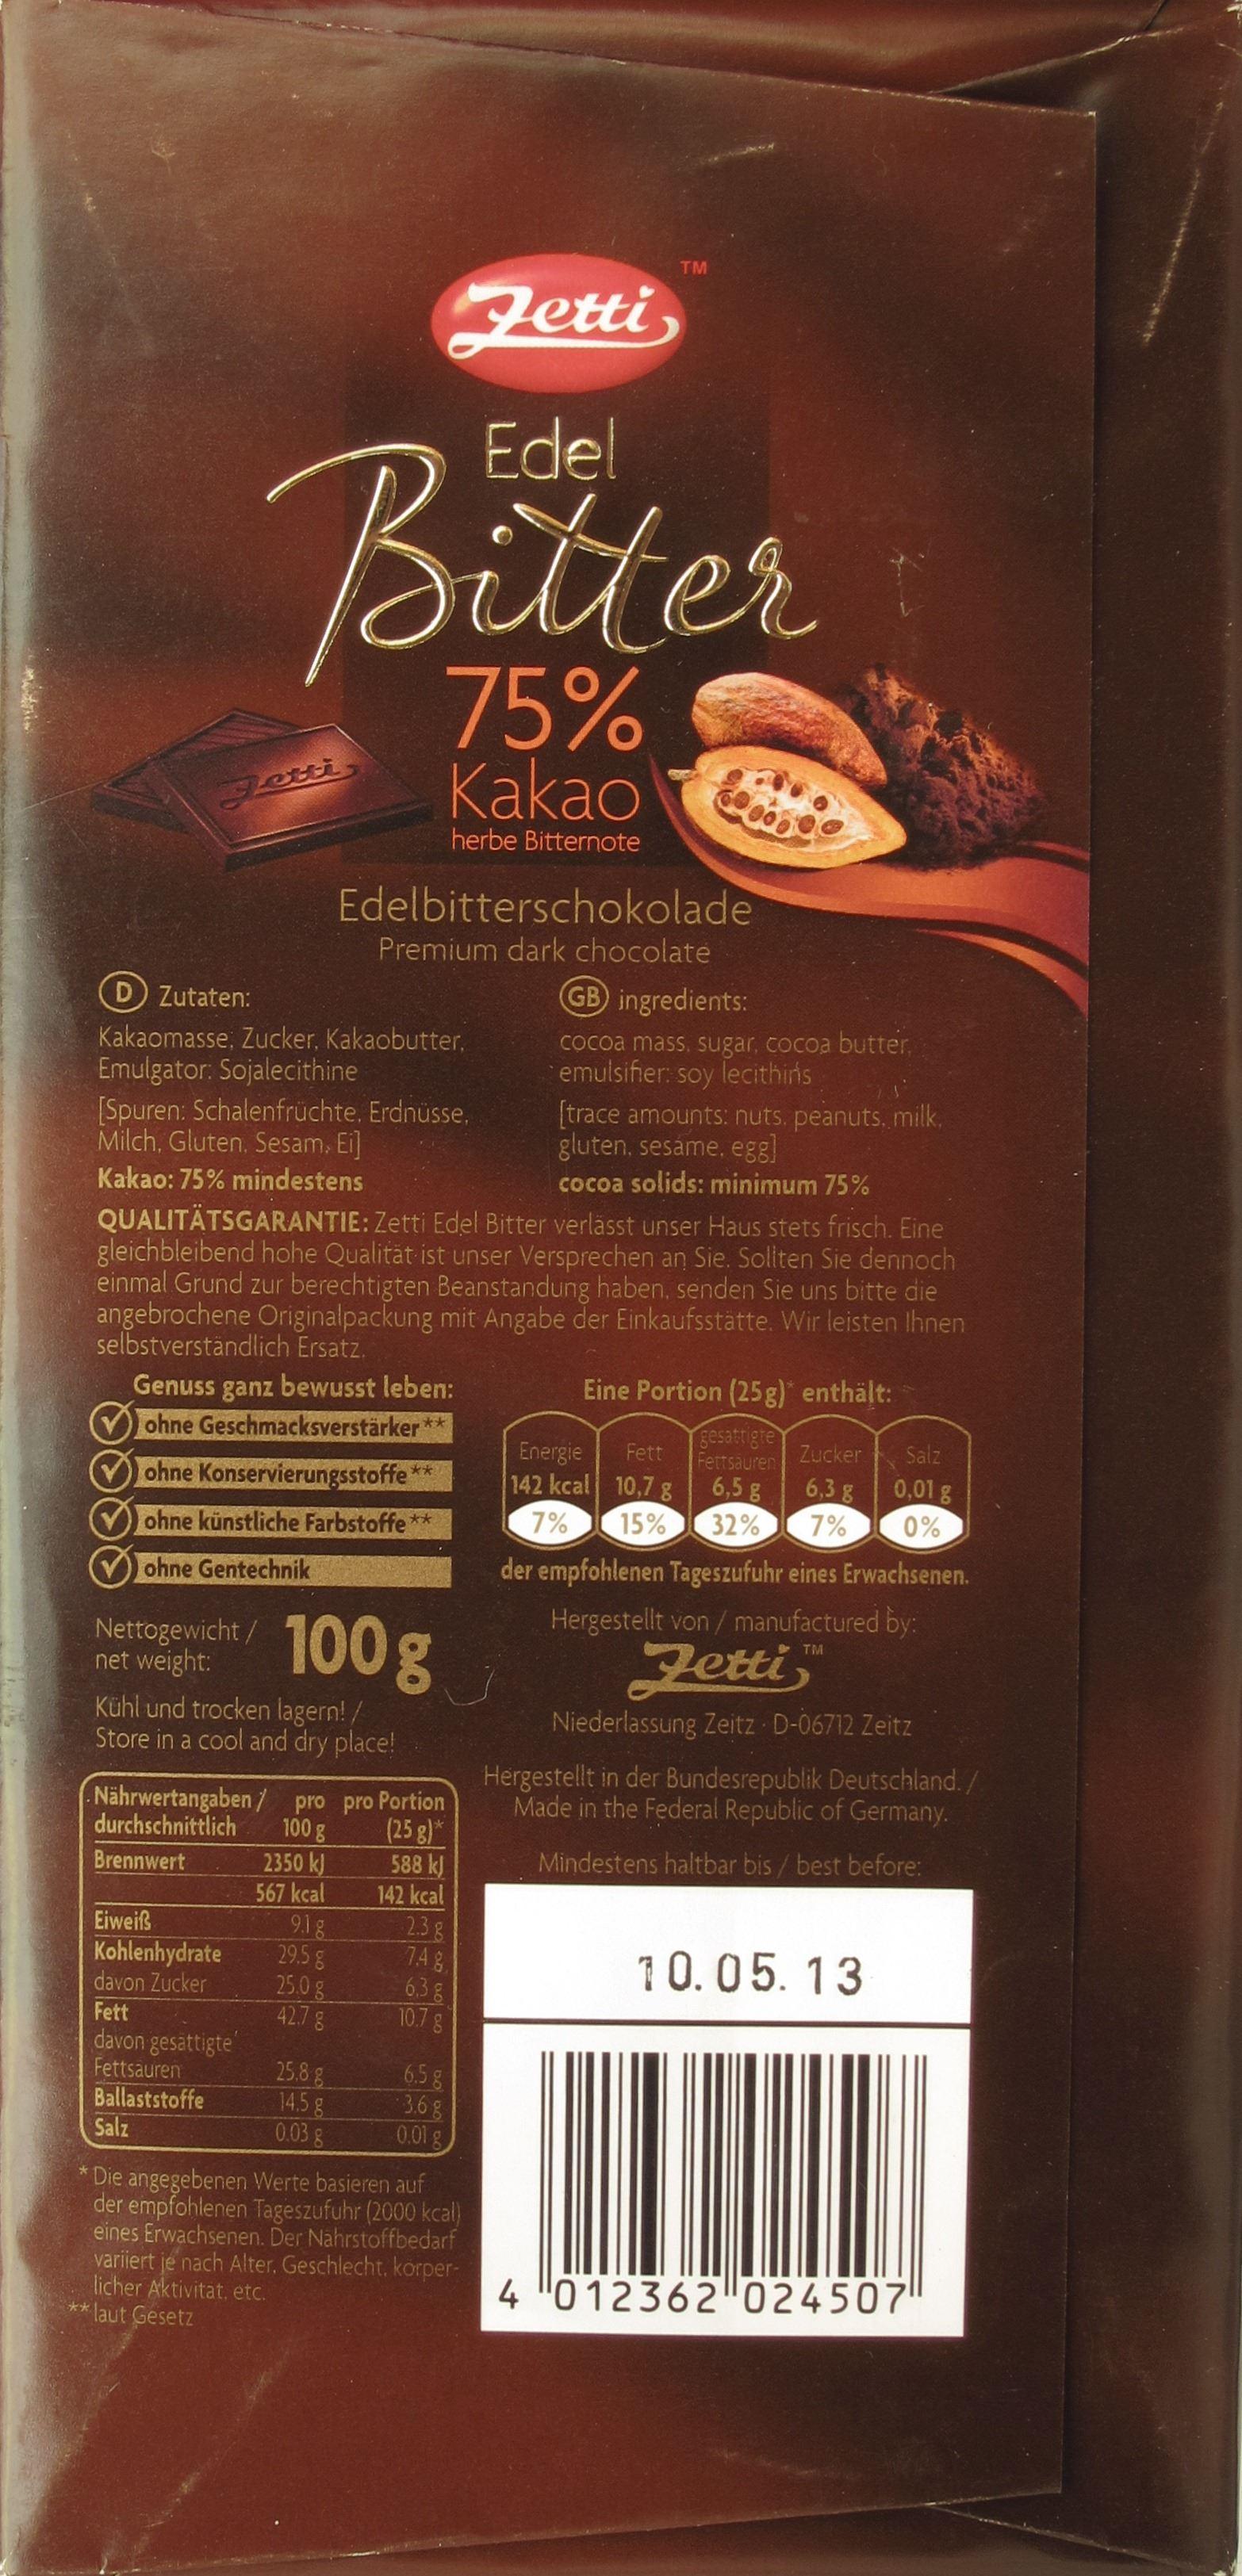 Tafel Zetti Bitterschokolade, 75% - Inhaltsangaben